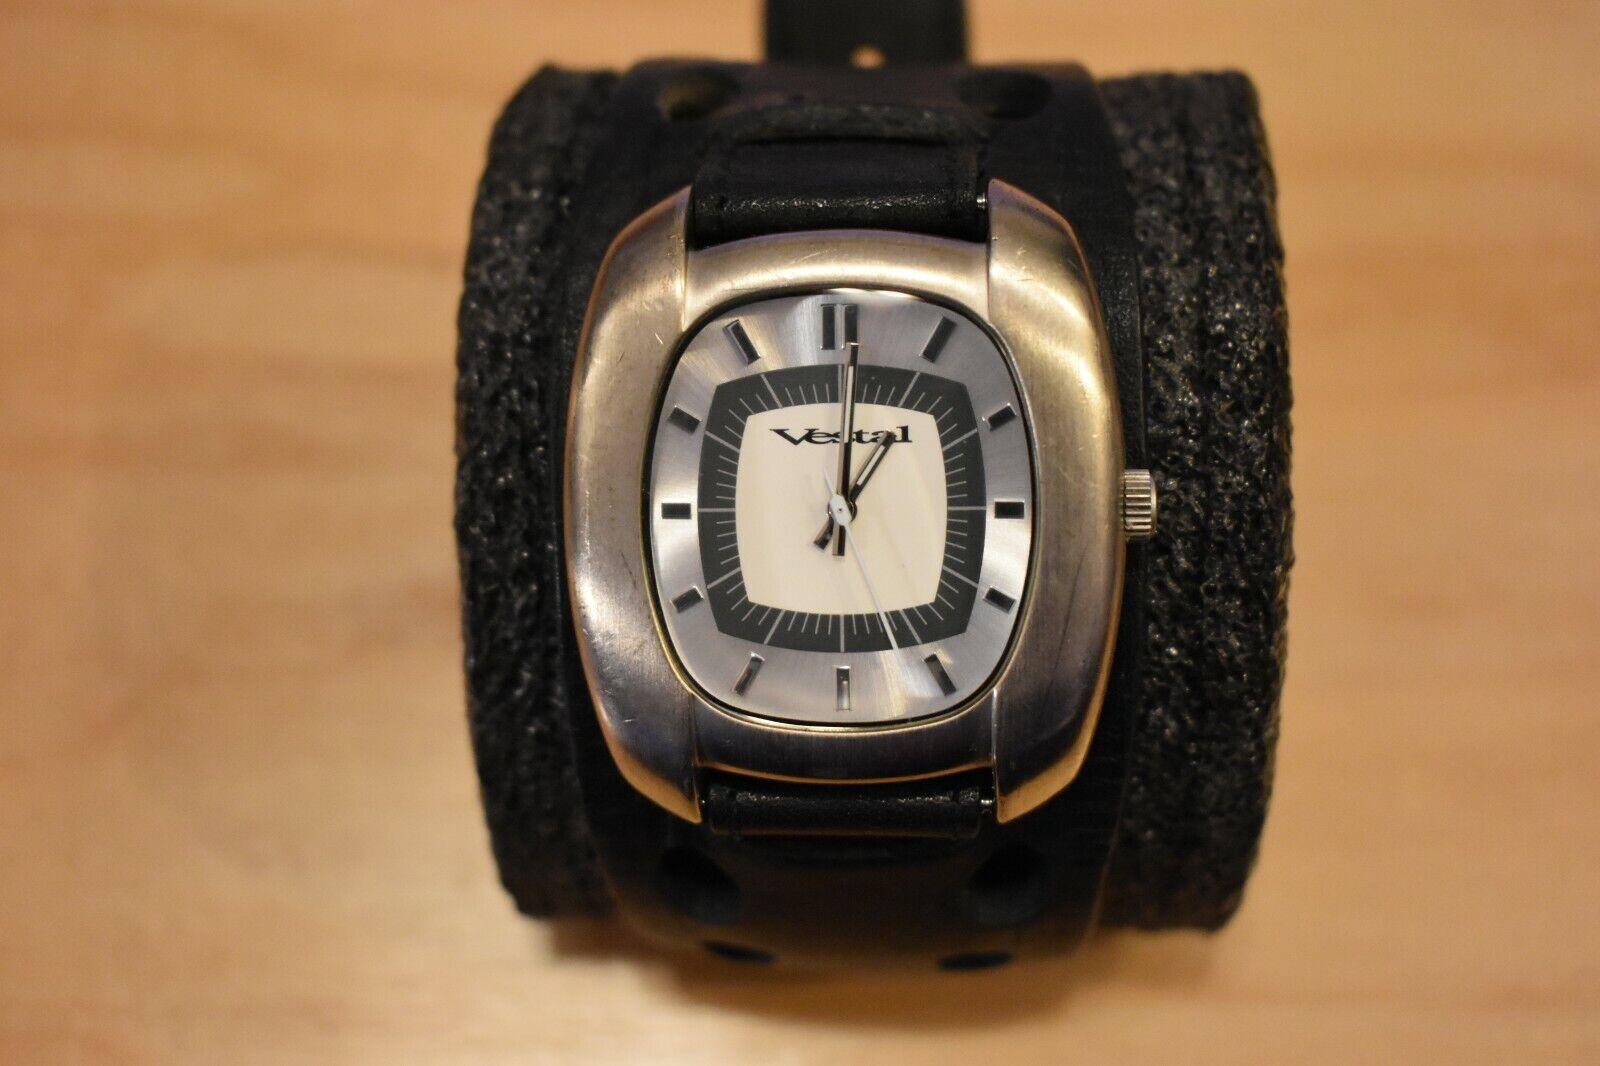 Vestal Super-Fi Watch Blk - $39.99